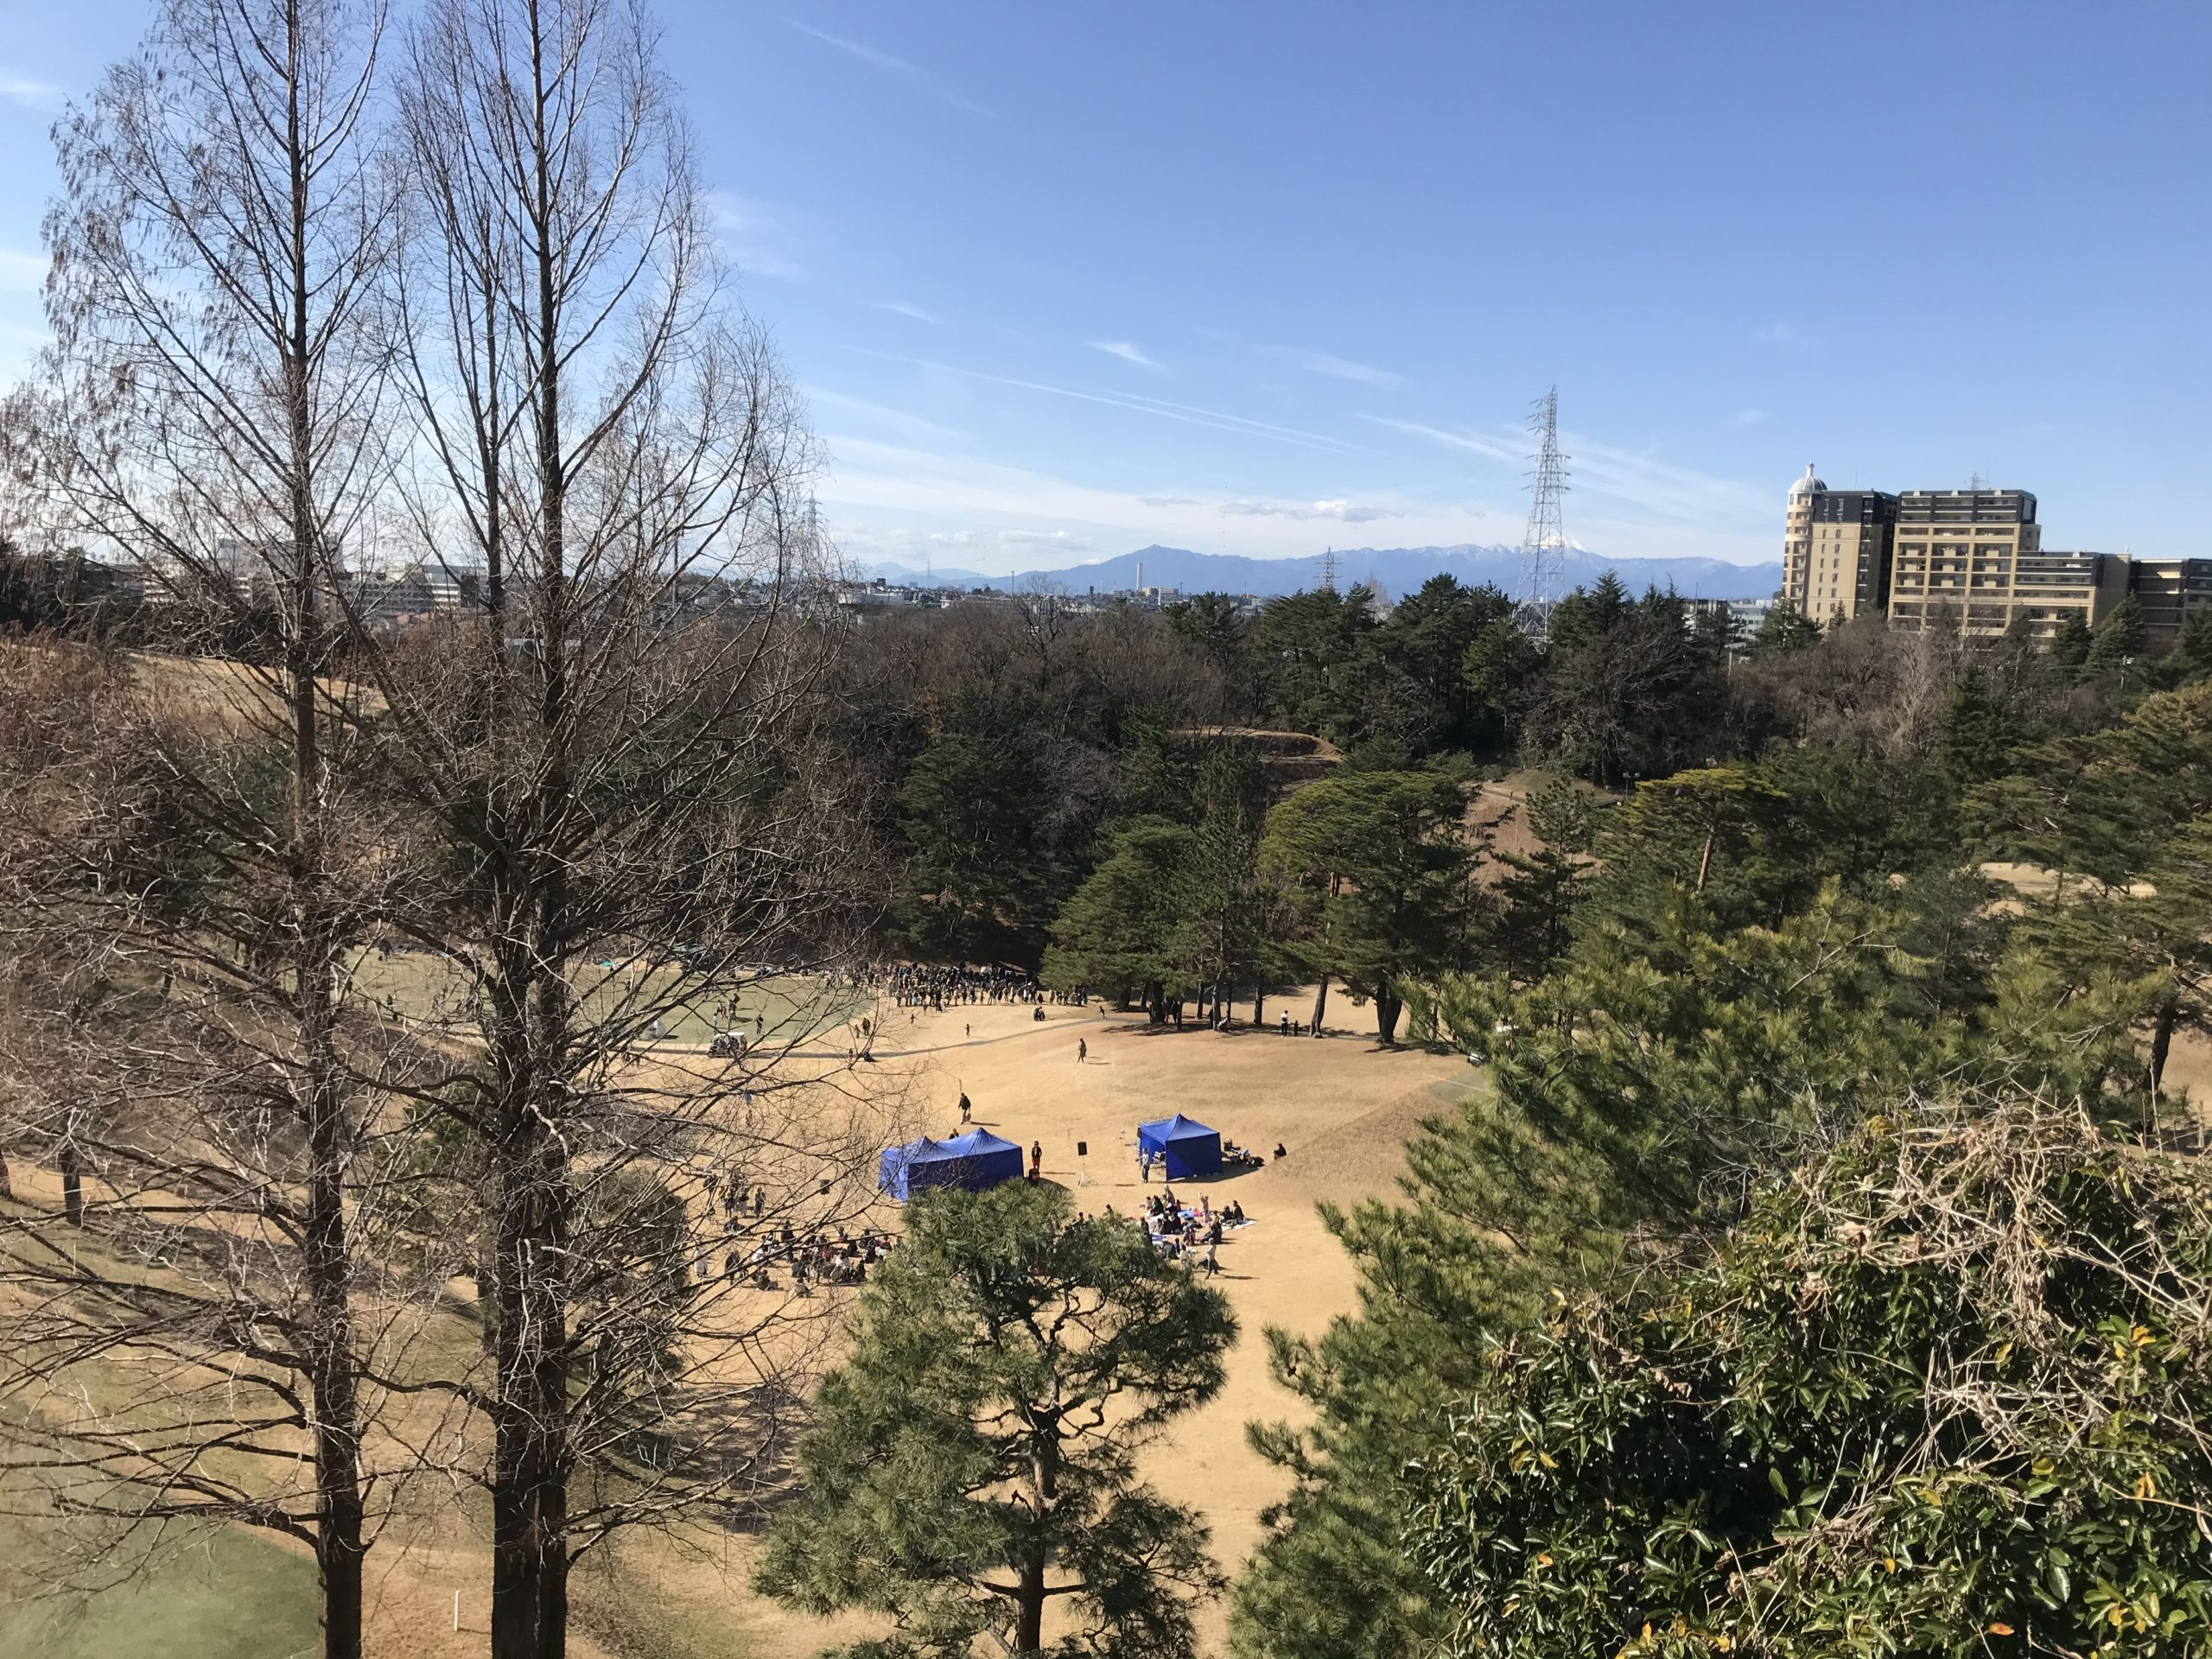 生田緑地ゴルフ場市民開放日